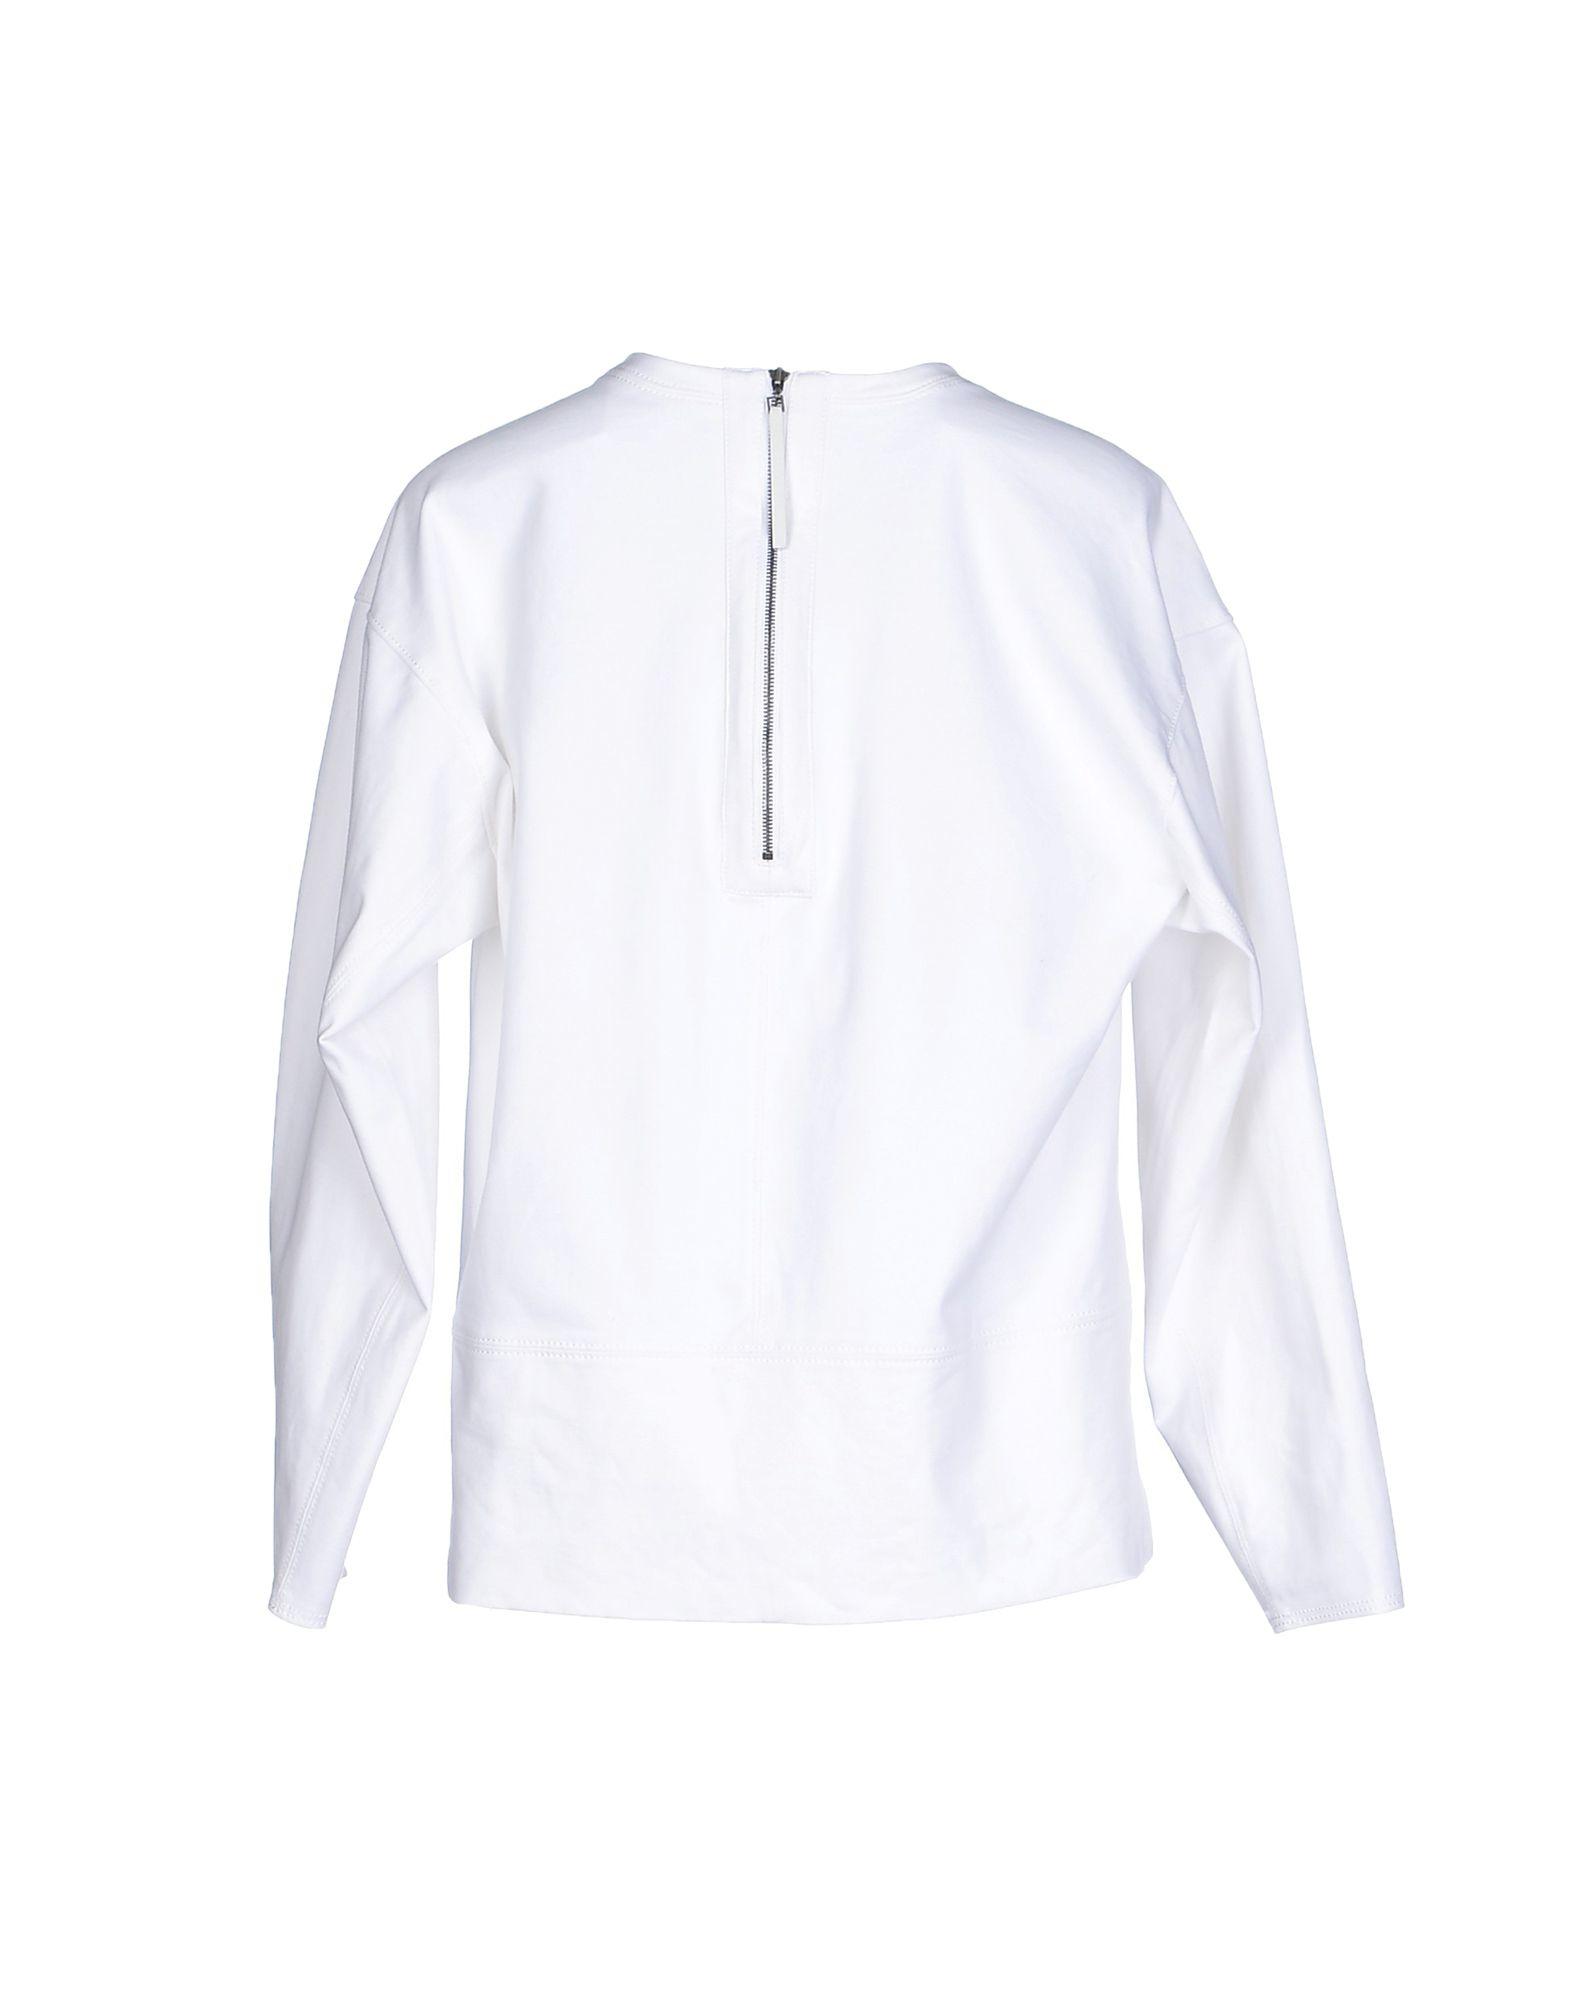 Helmut lang t shirt in white lyst for Helmut lang t shirt